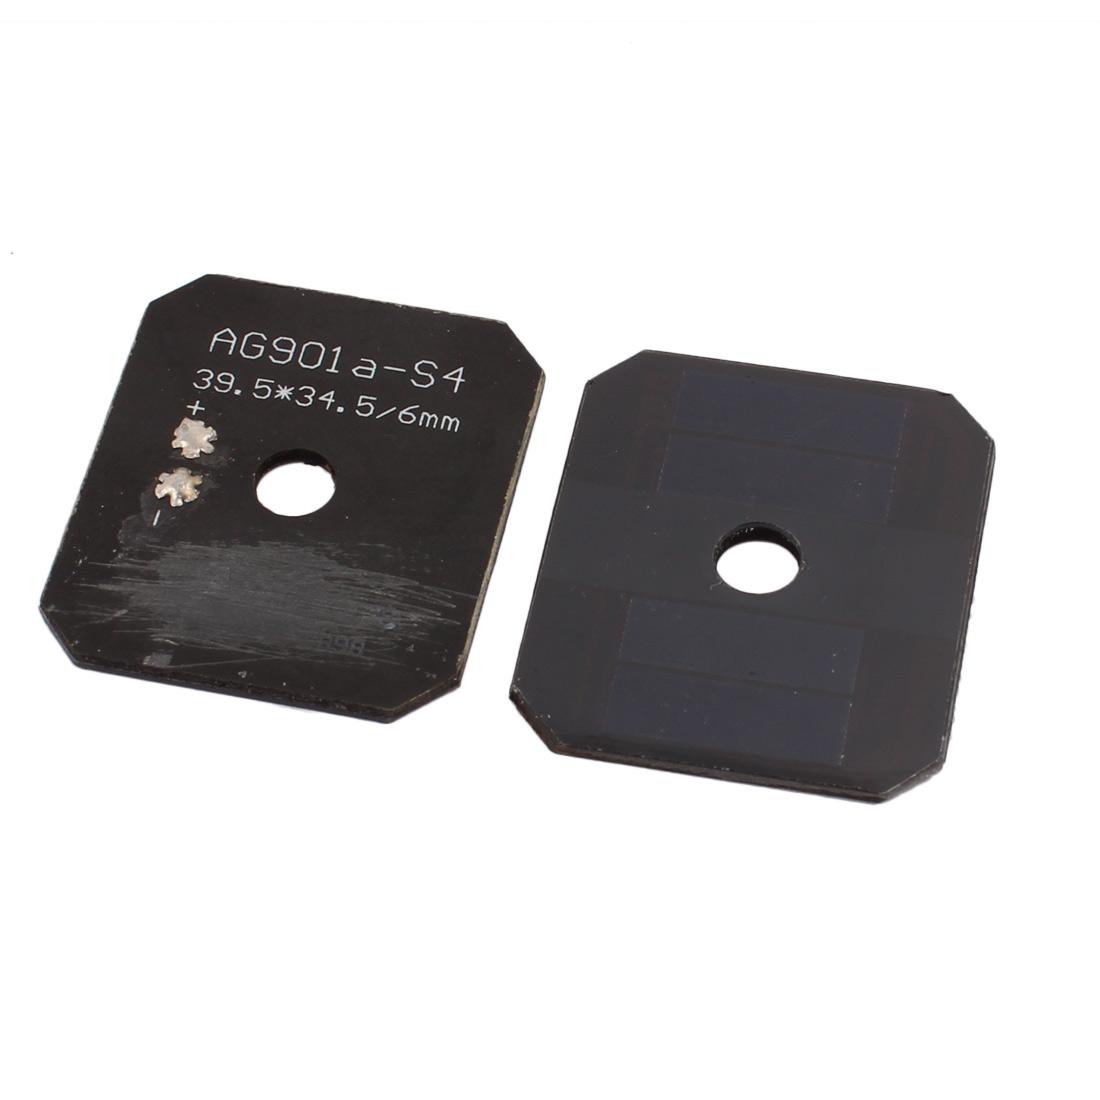 2 Pcs 39.5mm x 34.5mm 2V 40mA Monocrystalline Silicon N Type Solar Panel